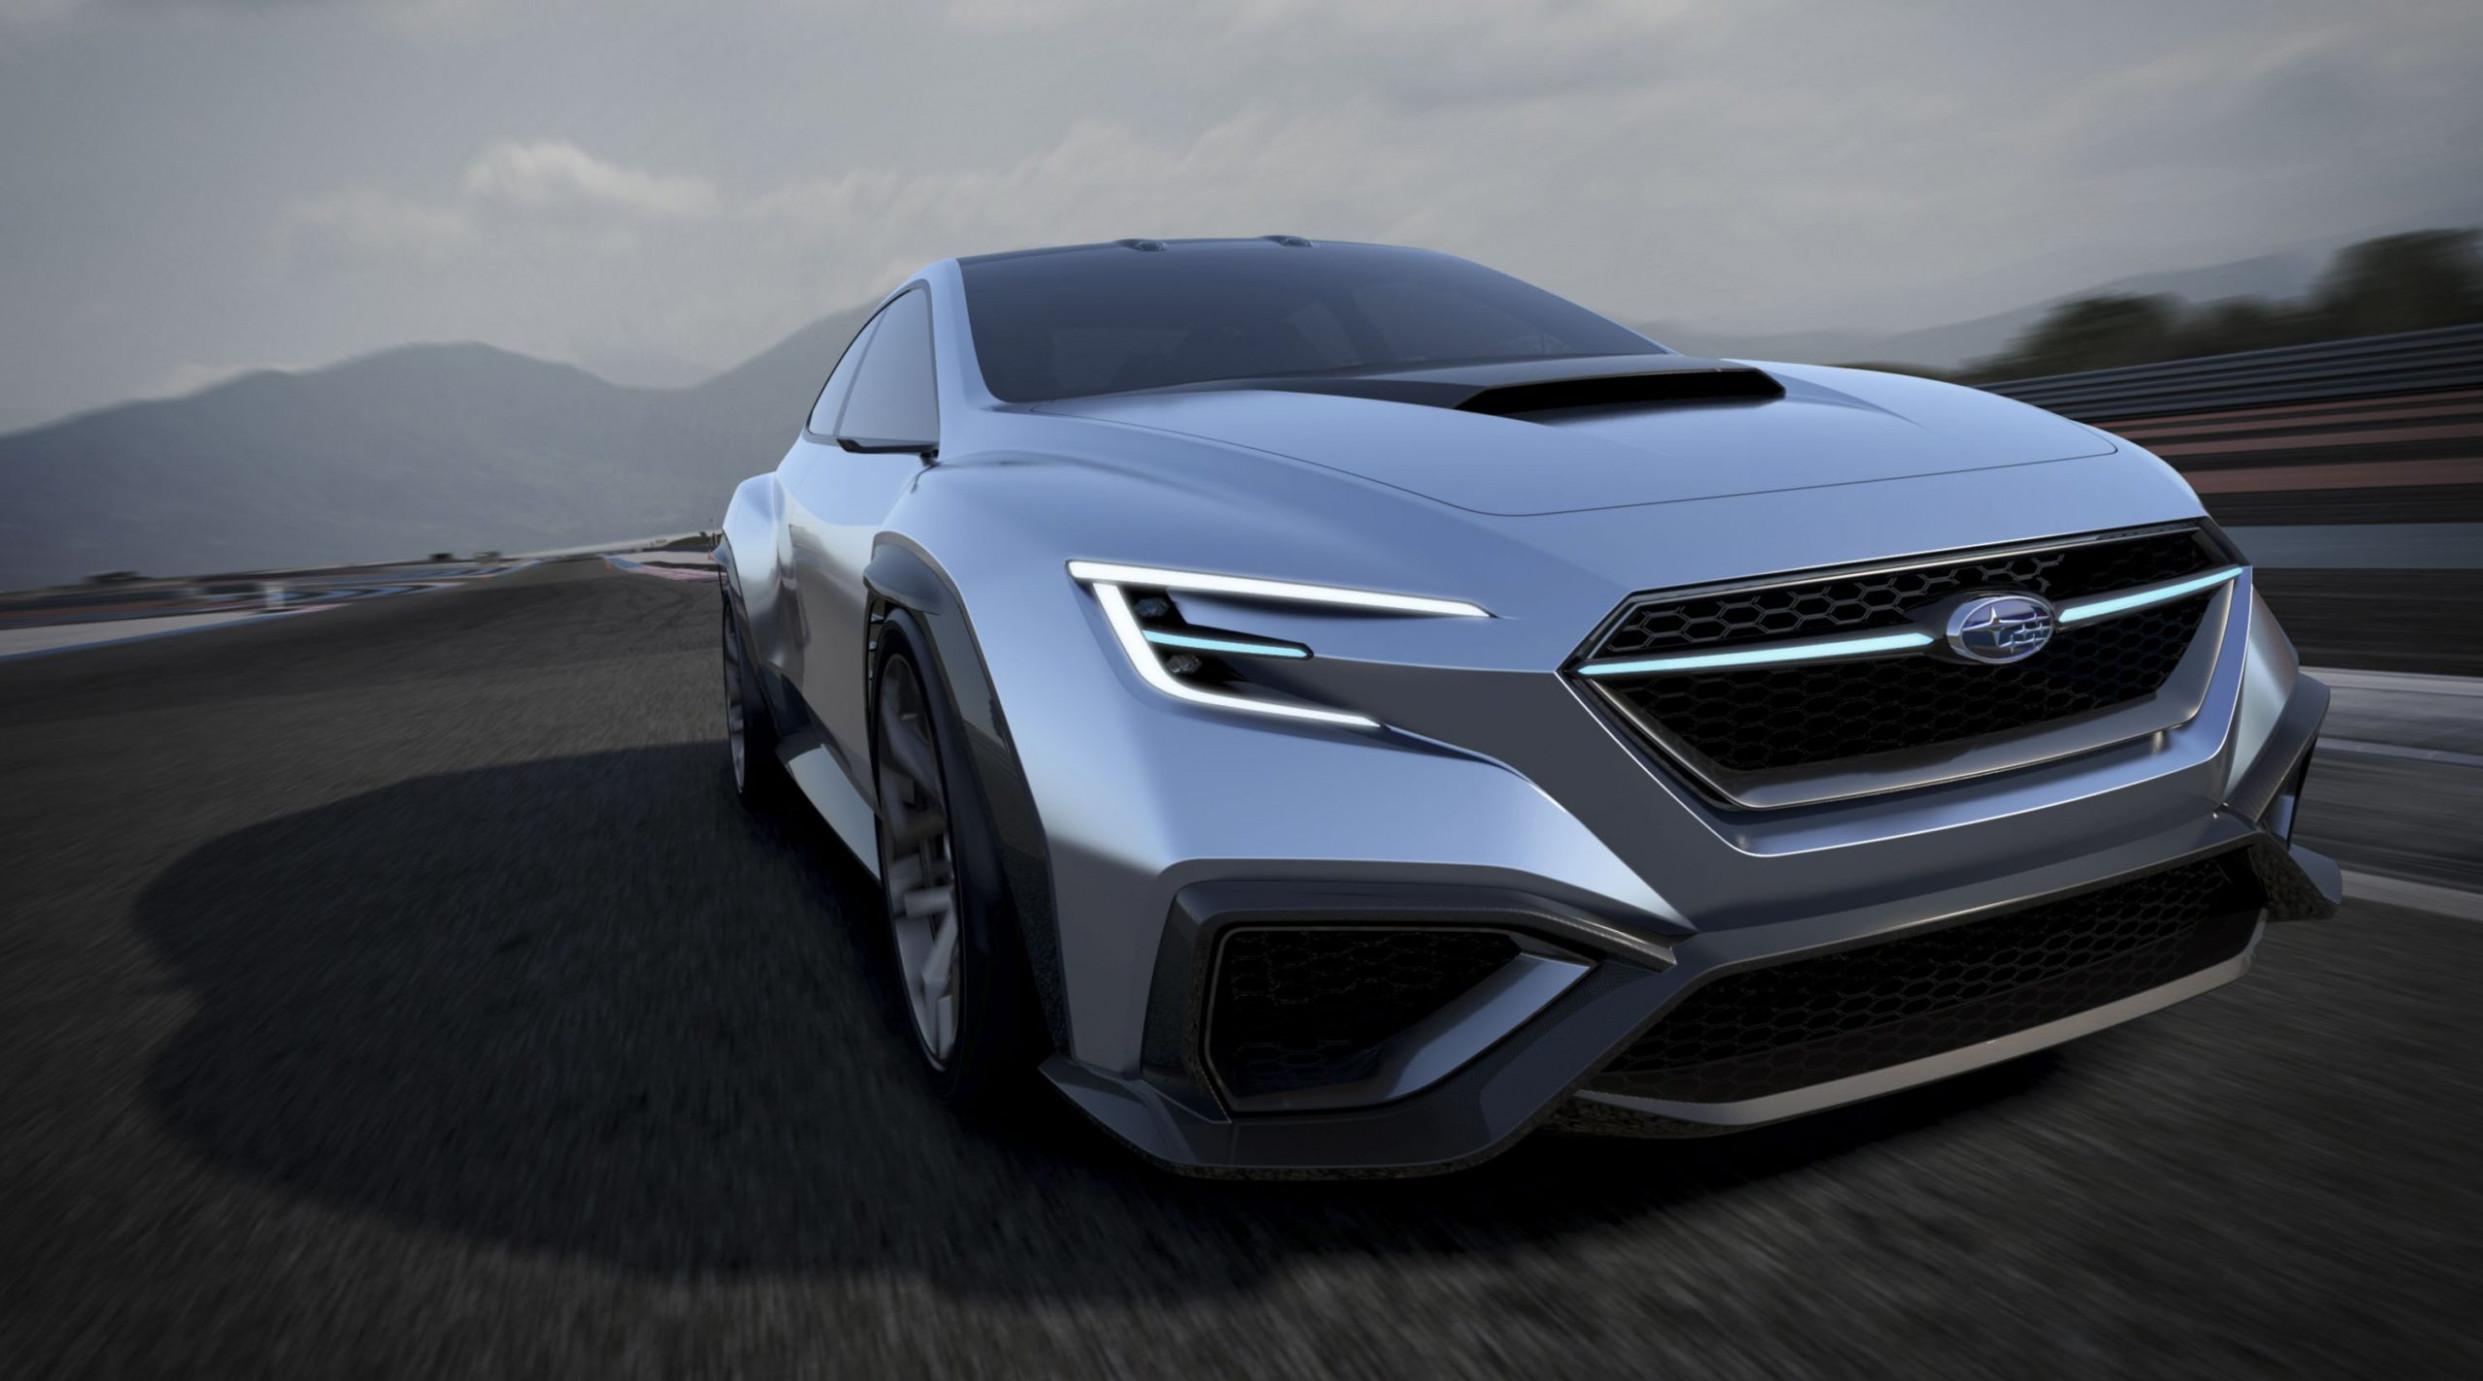 Concept Subaru Wrx Hatchback 2022